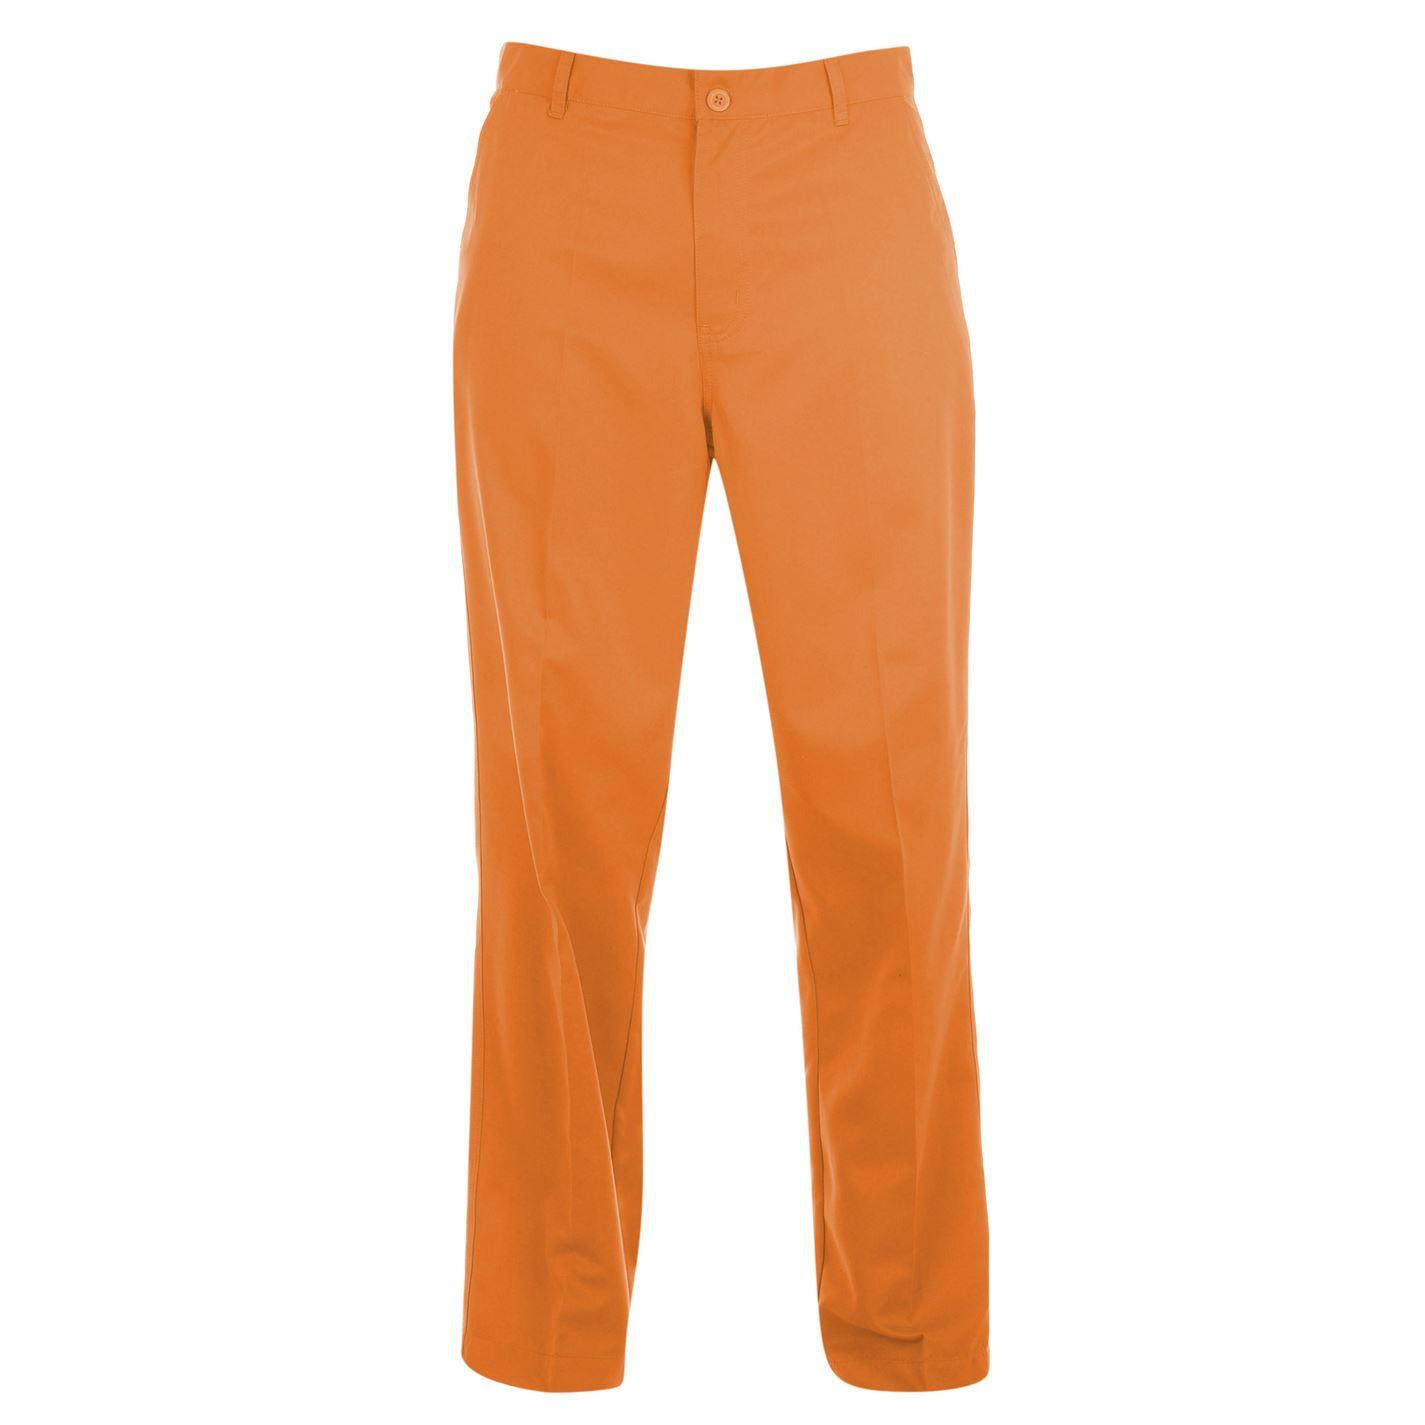 Dunlop Golf Bright Trousers pánske